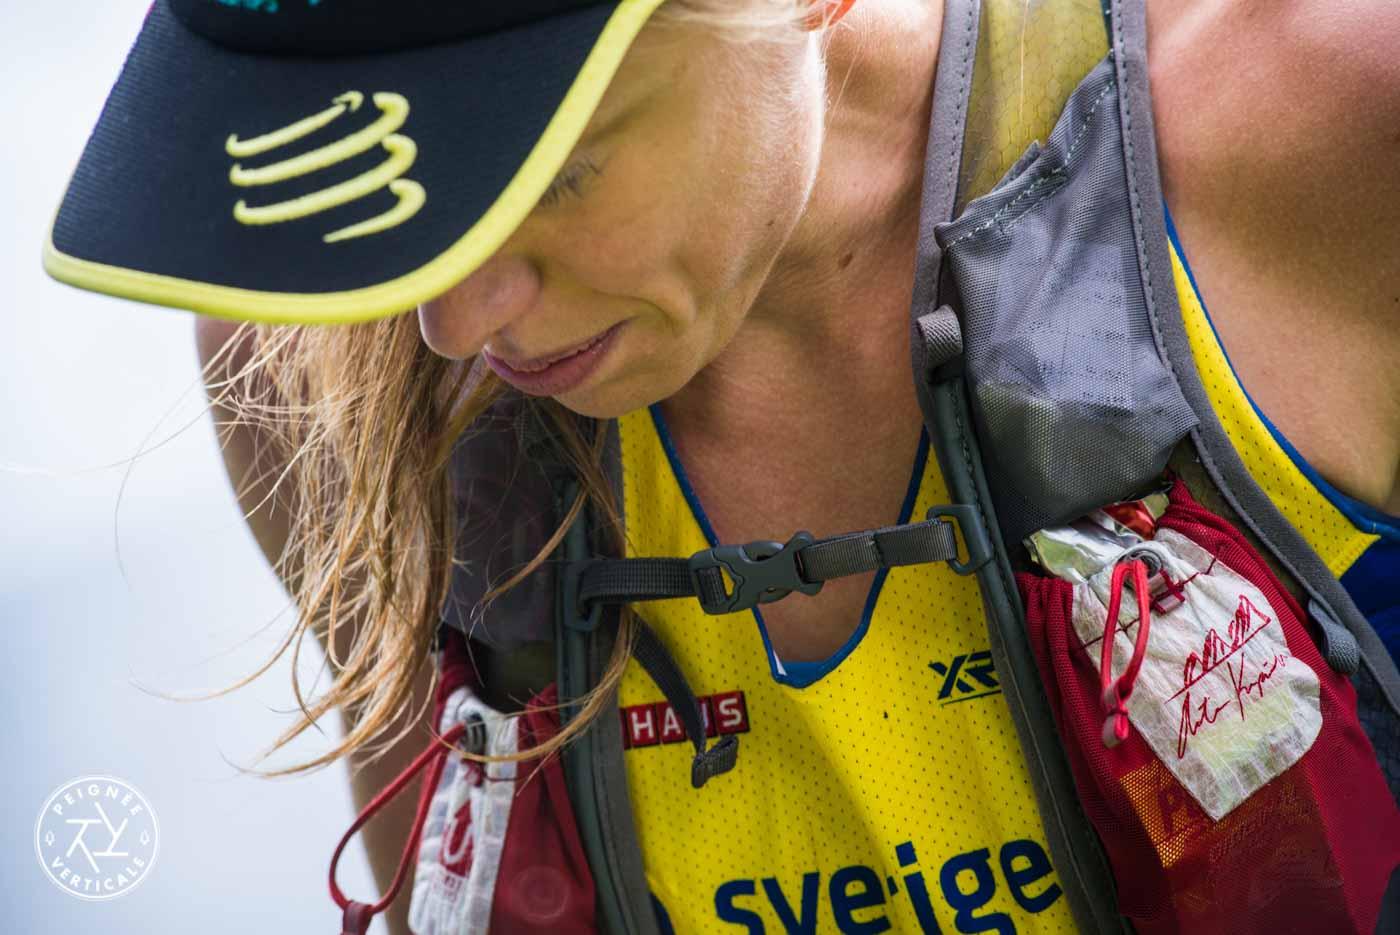 Clients-Maxi-Race-2015-Timothee-Nalet-Photographe-5378.jpg